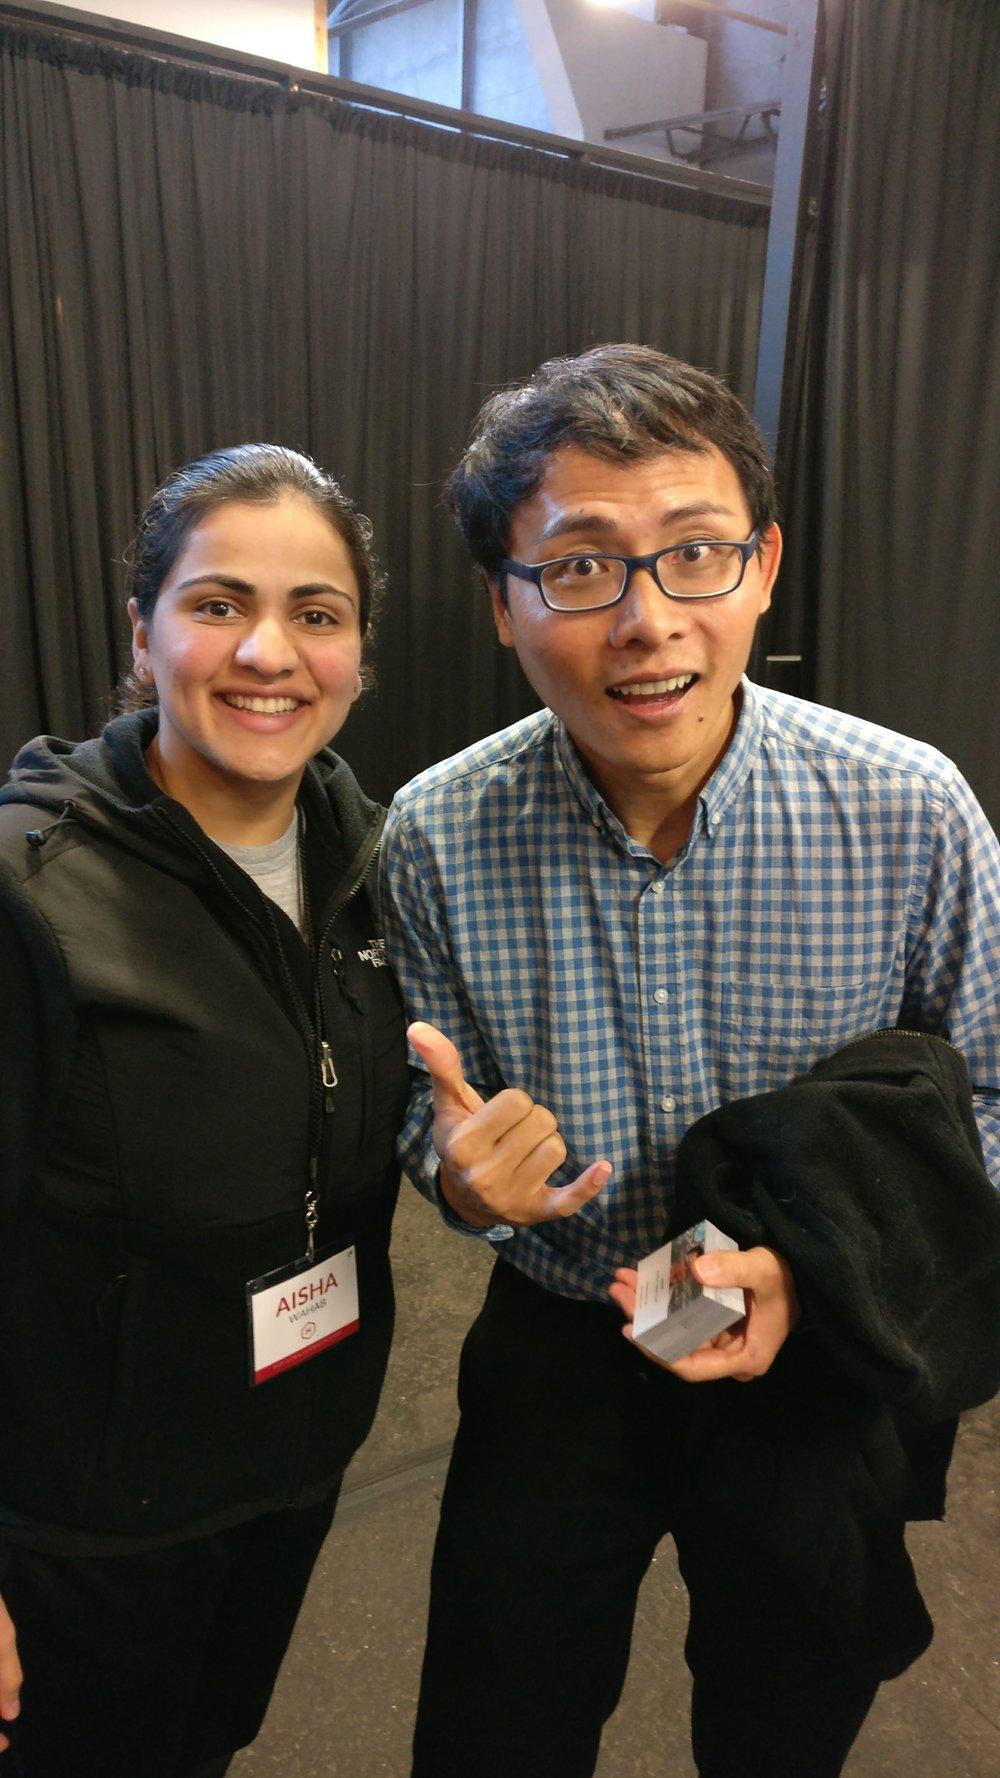 Google X Founder Tom Chi and Aisha